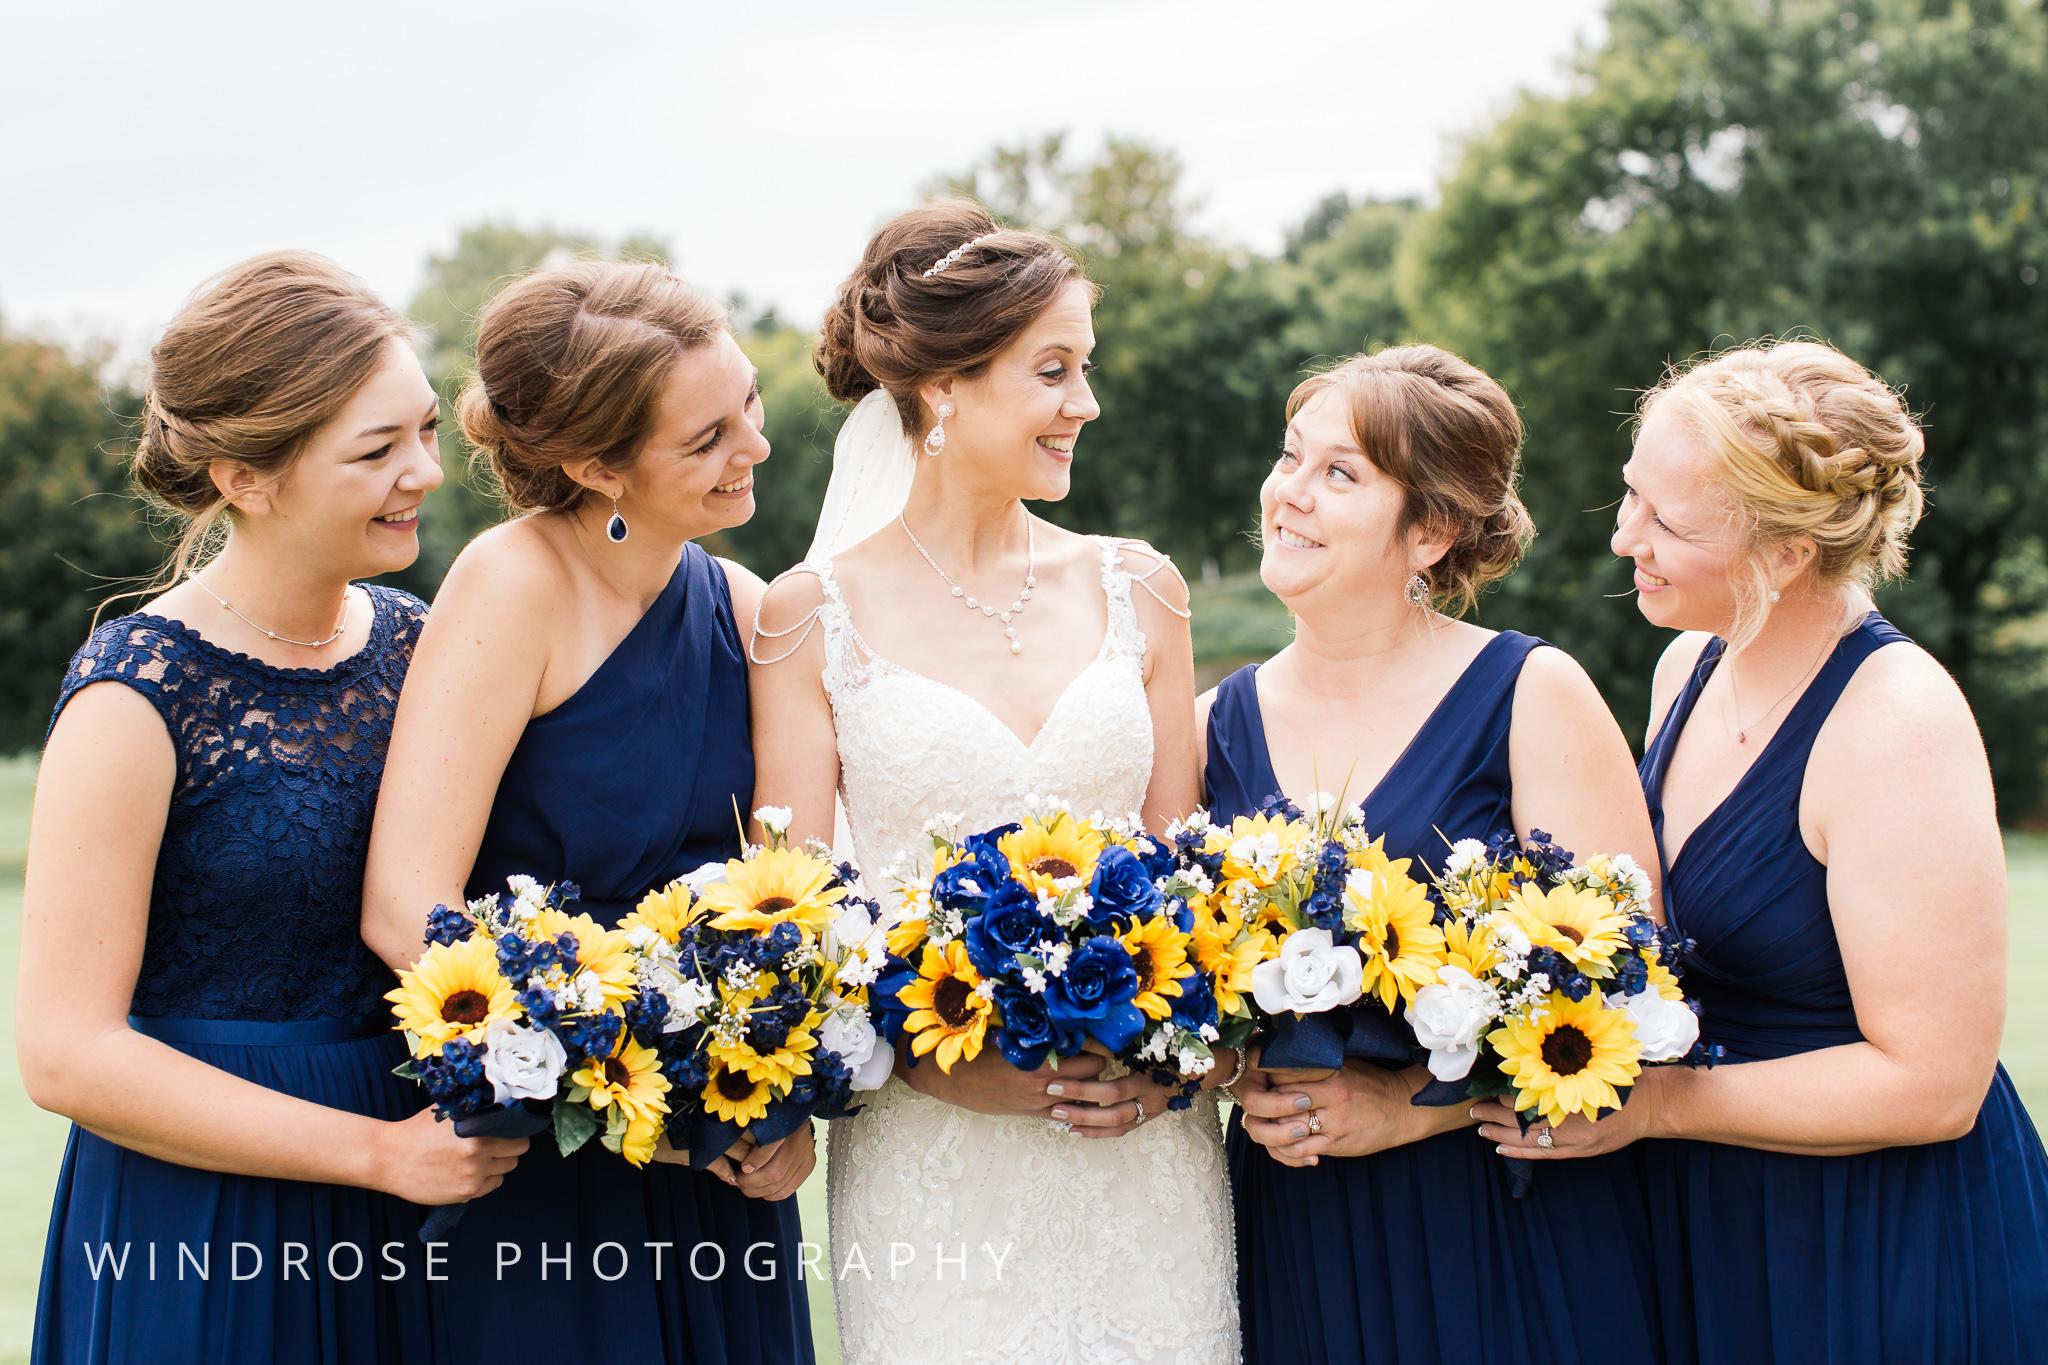 La-Crosse-Country-Club-Wedding-Minnesota-Wedding-Photographer-15.jpg